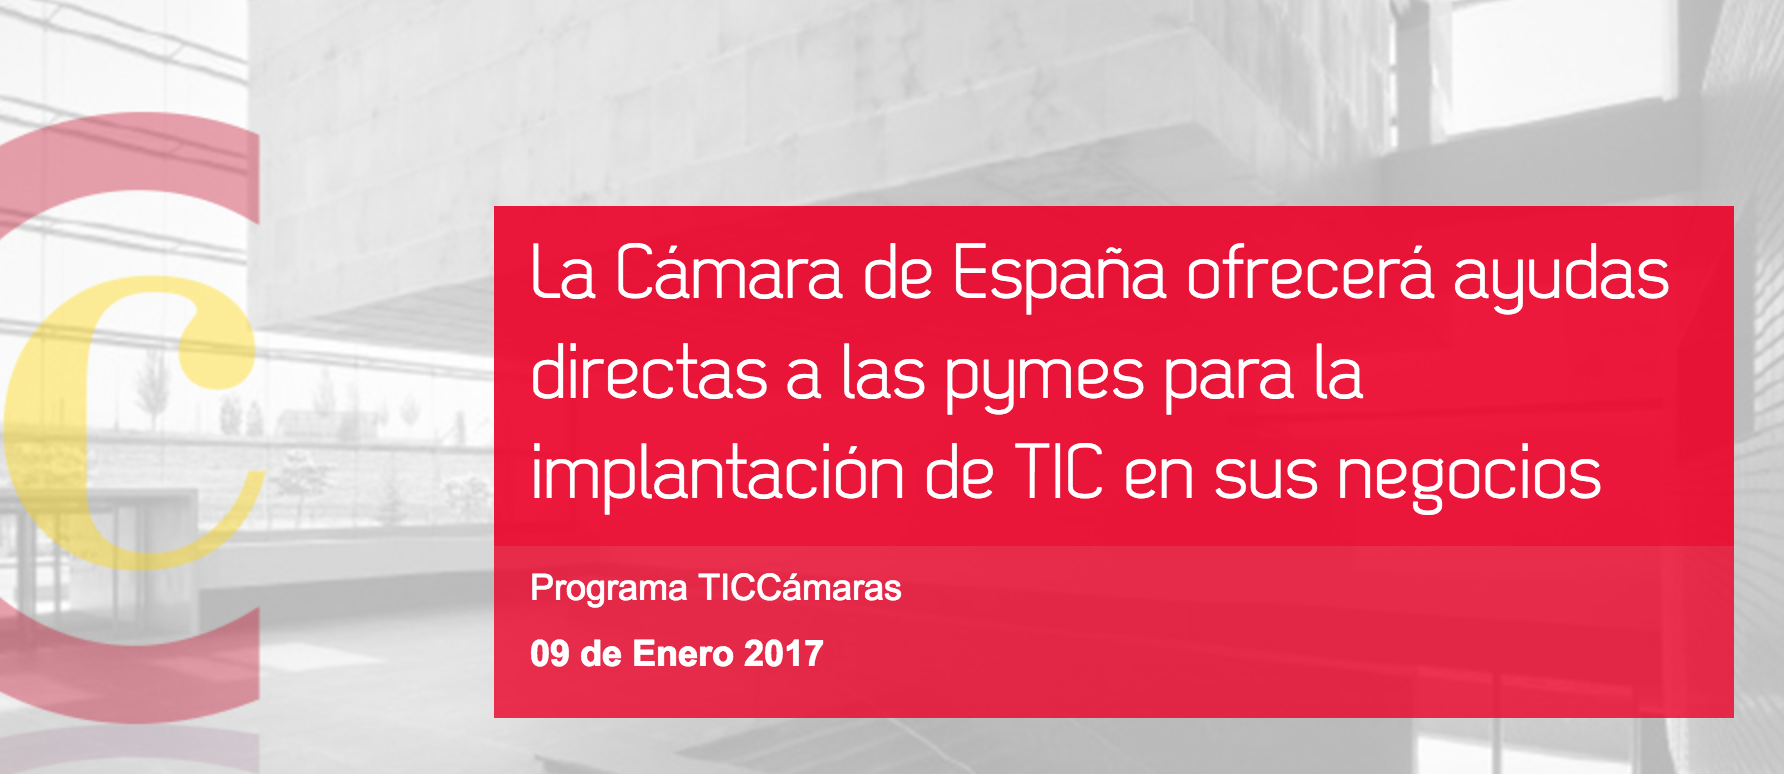 Ayudas-TICCamaras-InnoCamaras-Sevilla